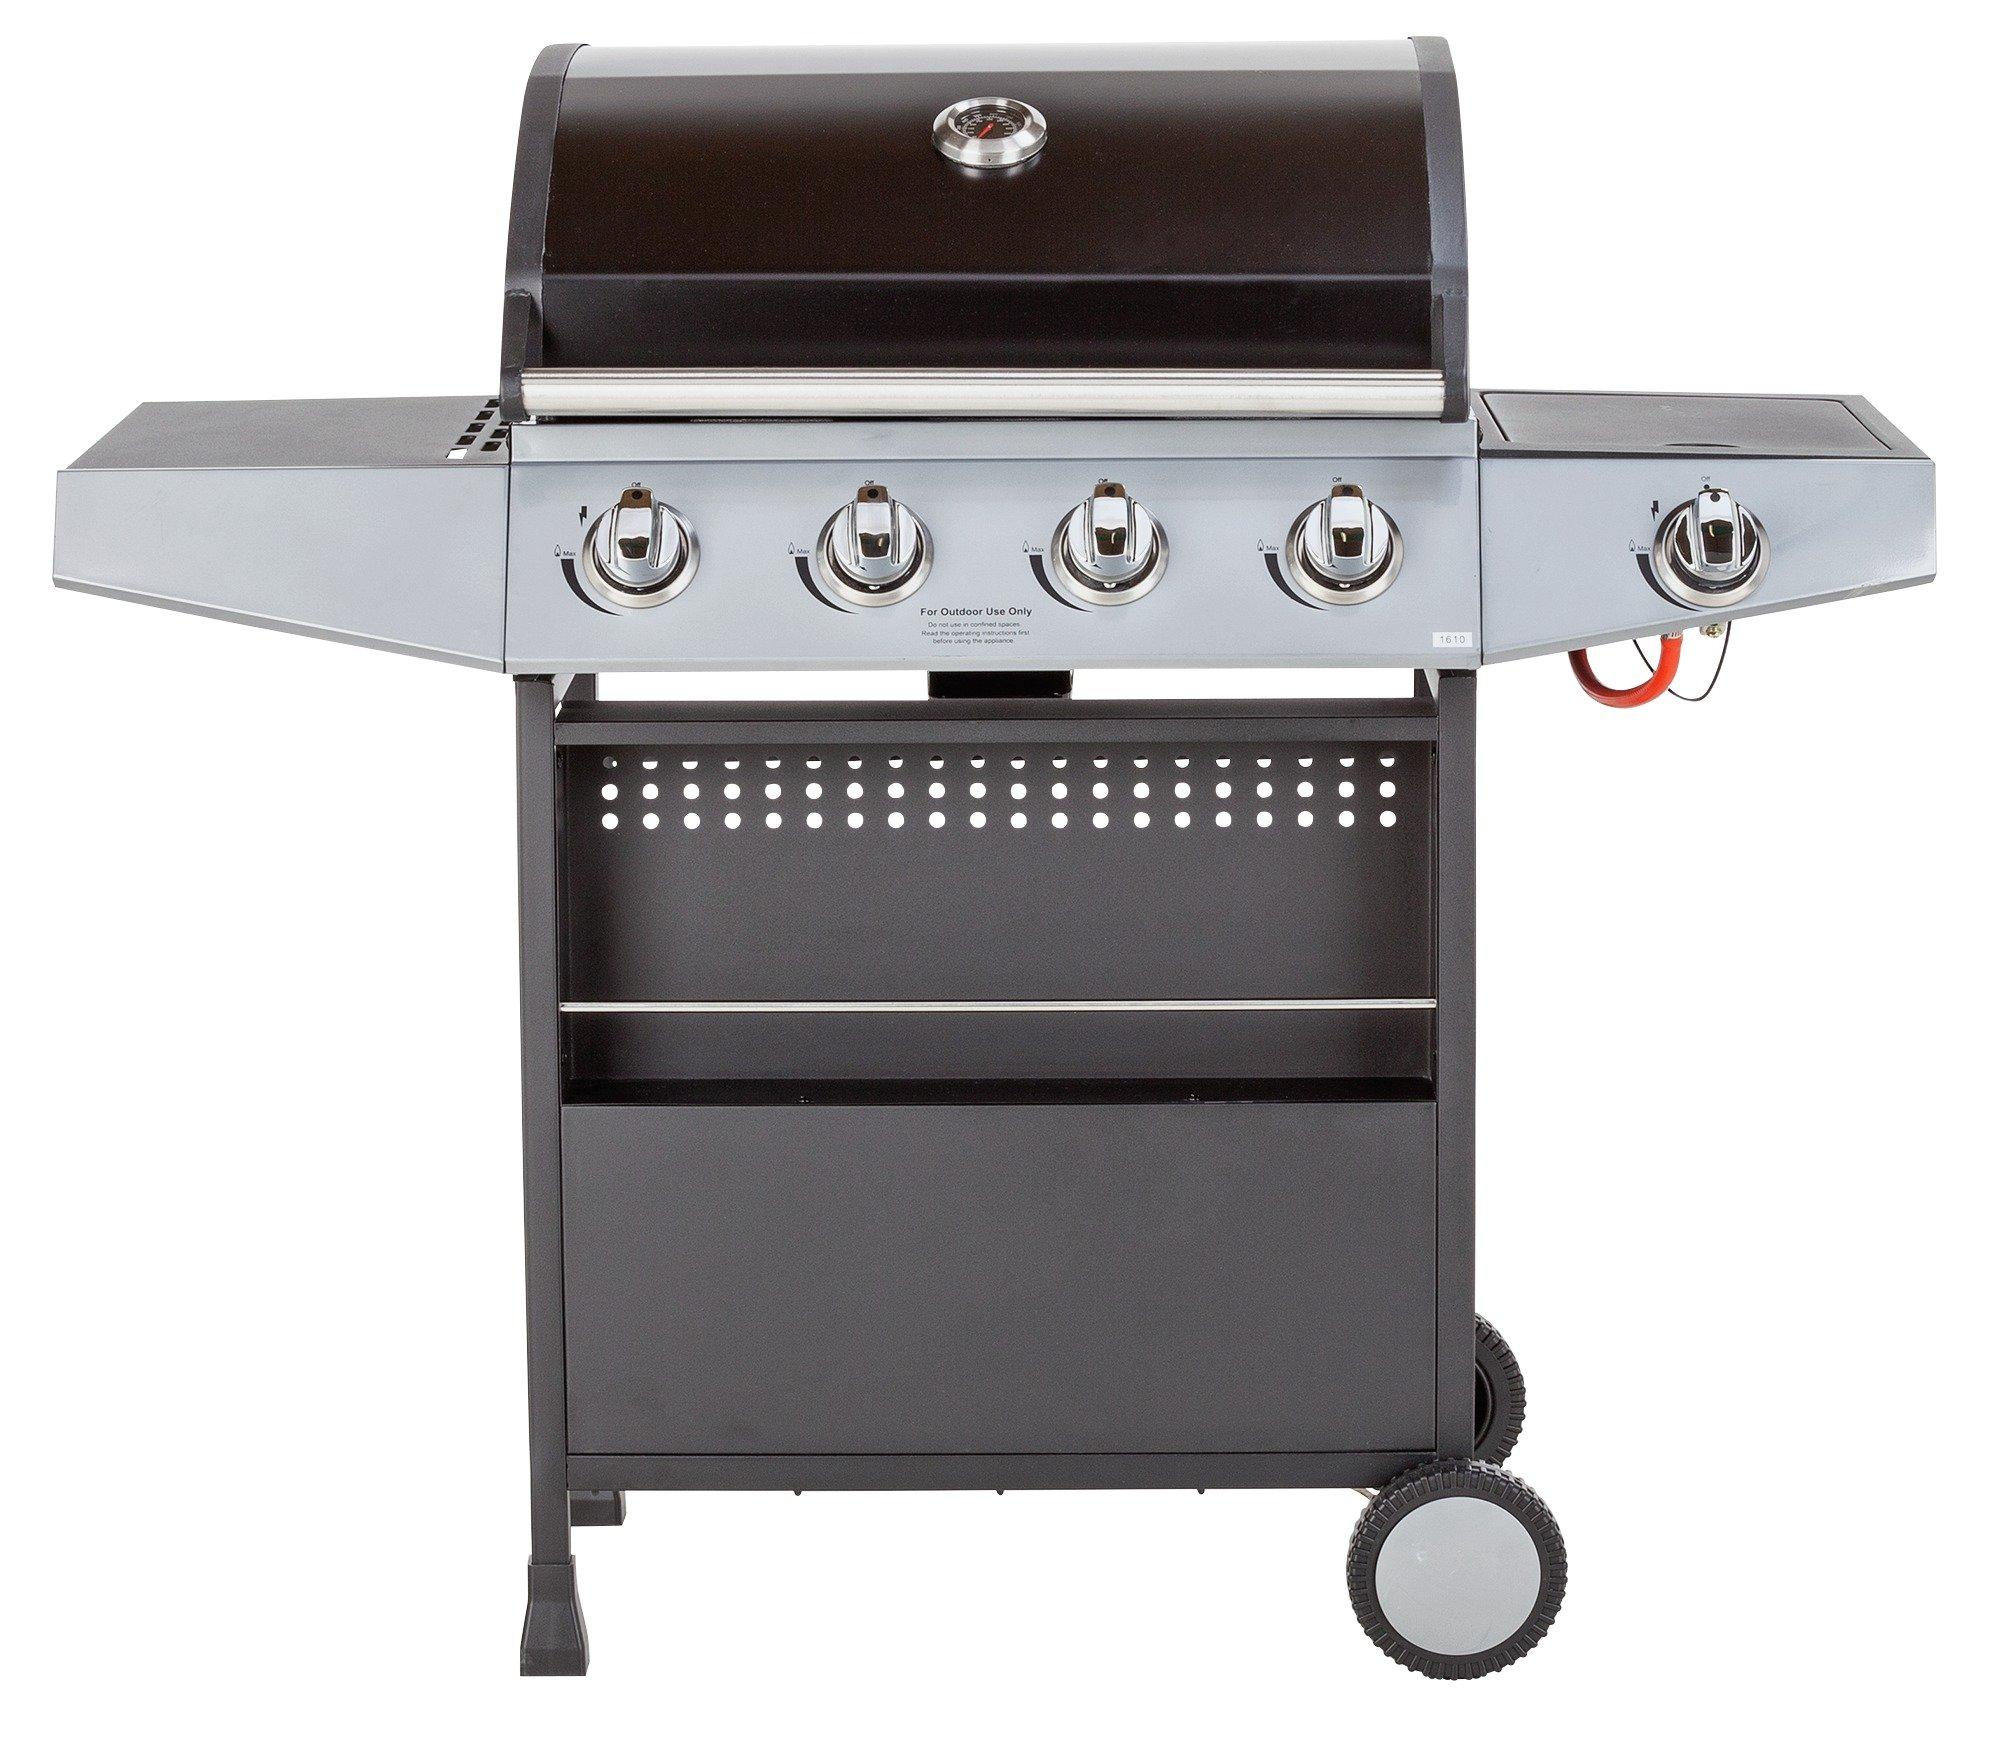 Premium 4 Burner Gas BBQ with Side Burner - Home Delivery